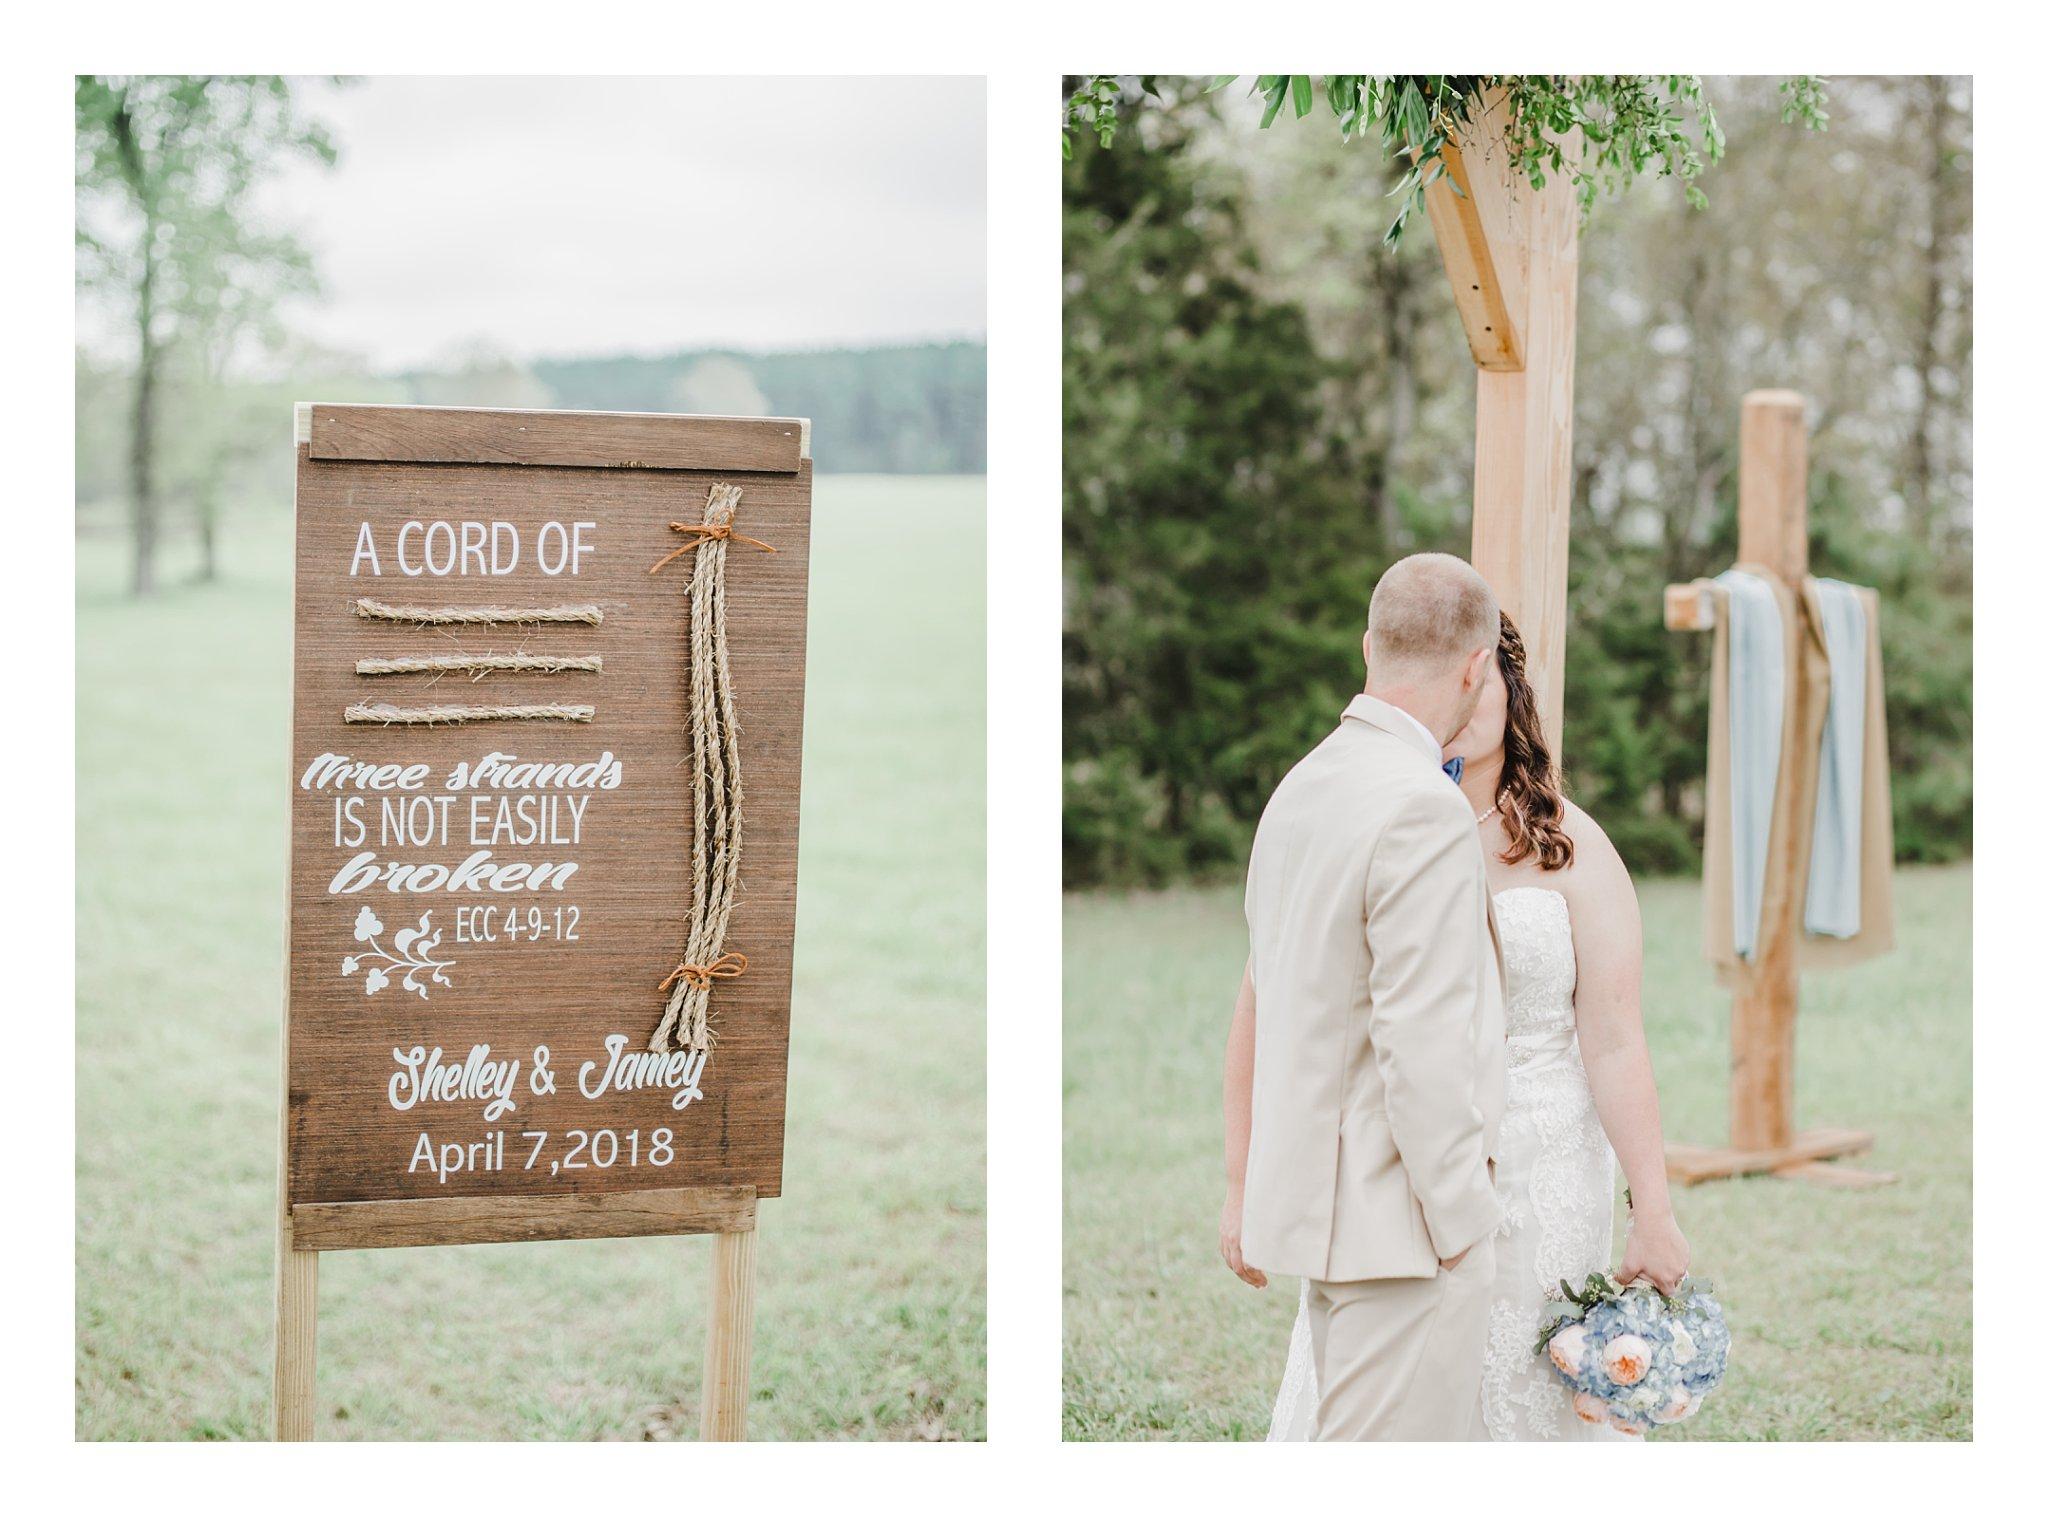 steel-blue-blush-spring-lace-gown-newberry-sc-wedding-photos-_0015.jpg